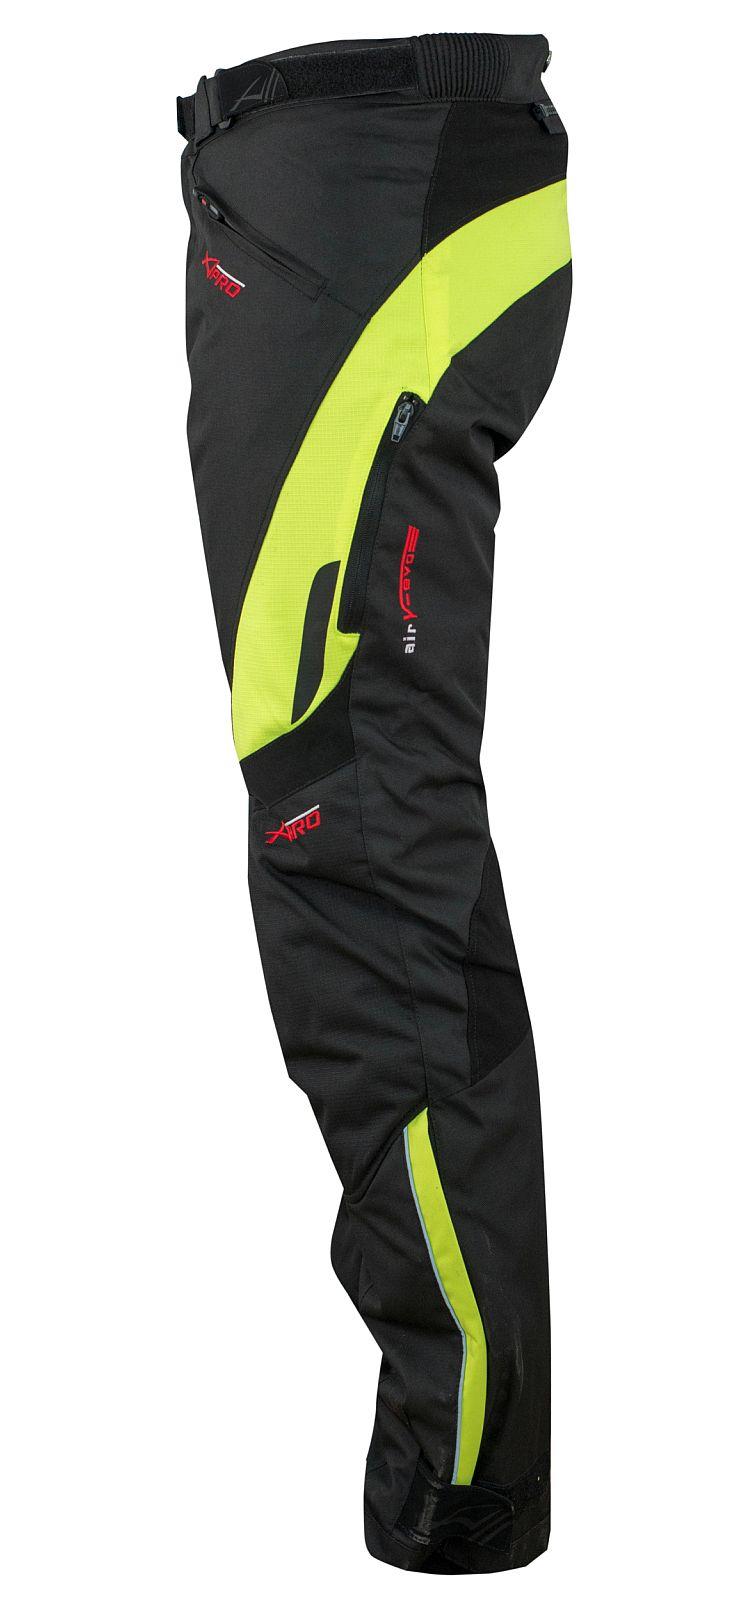 miniatuur 14 - Pantaloni Impermeabile Moto Imbottitura Termica Estraibile Traspirante Cordura